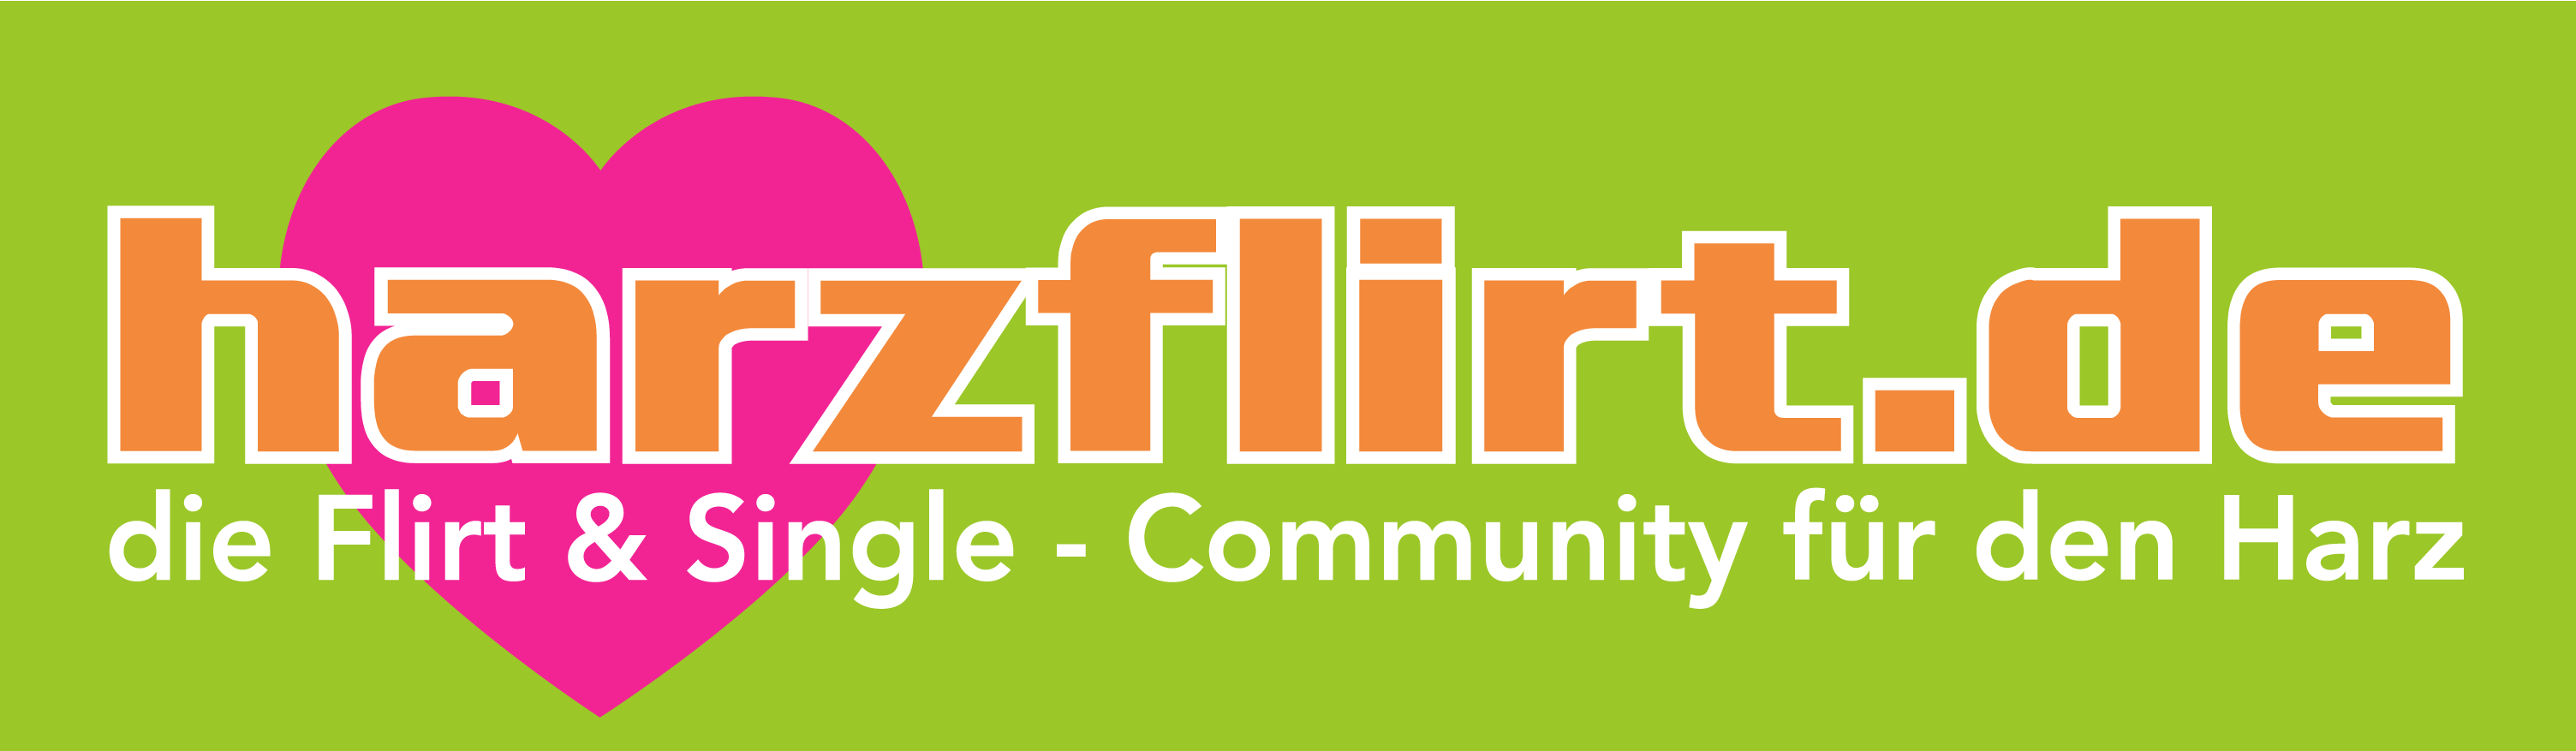 Harzflirt Logo